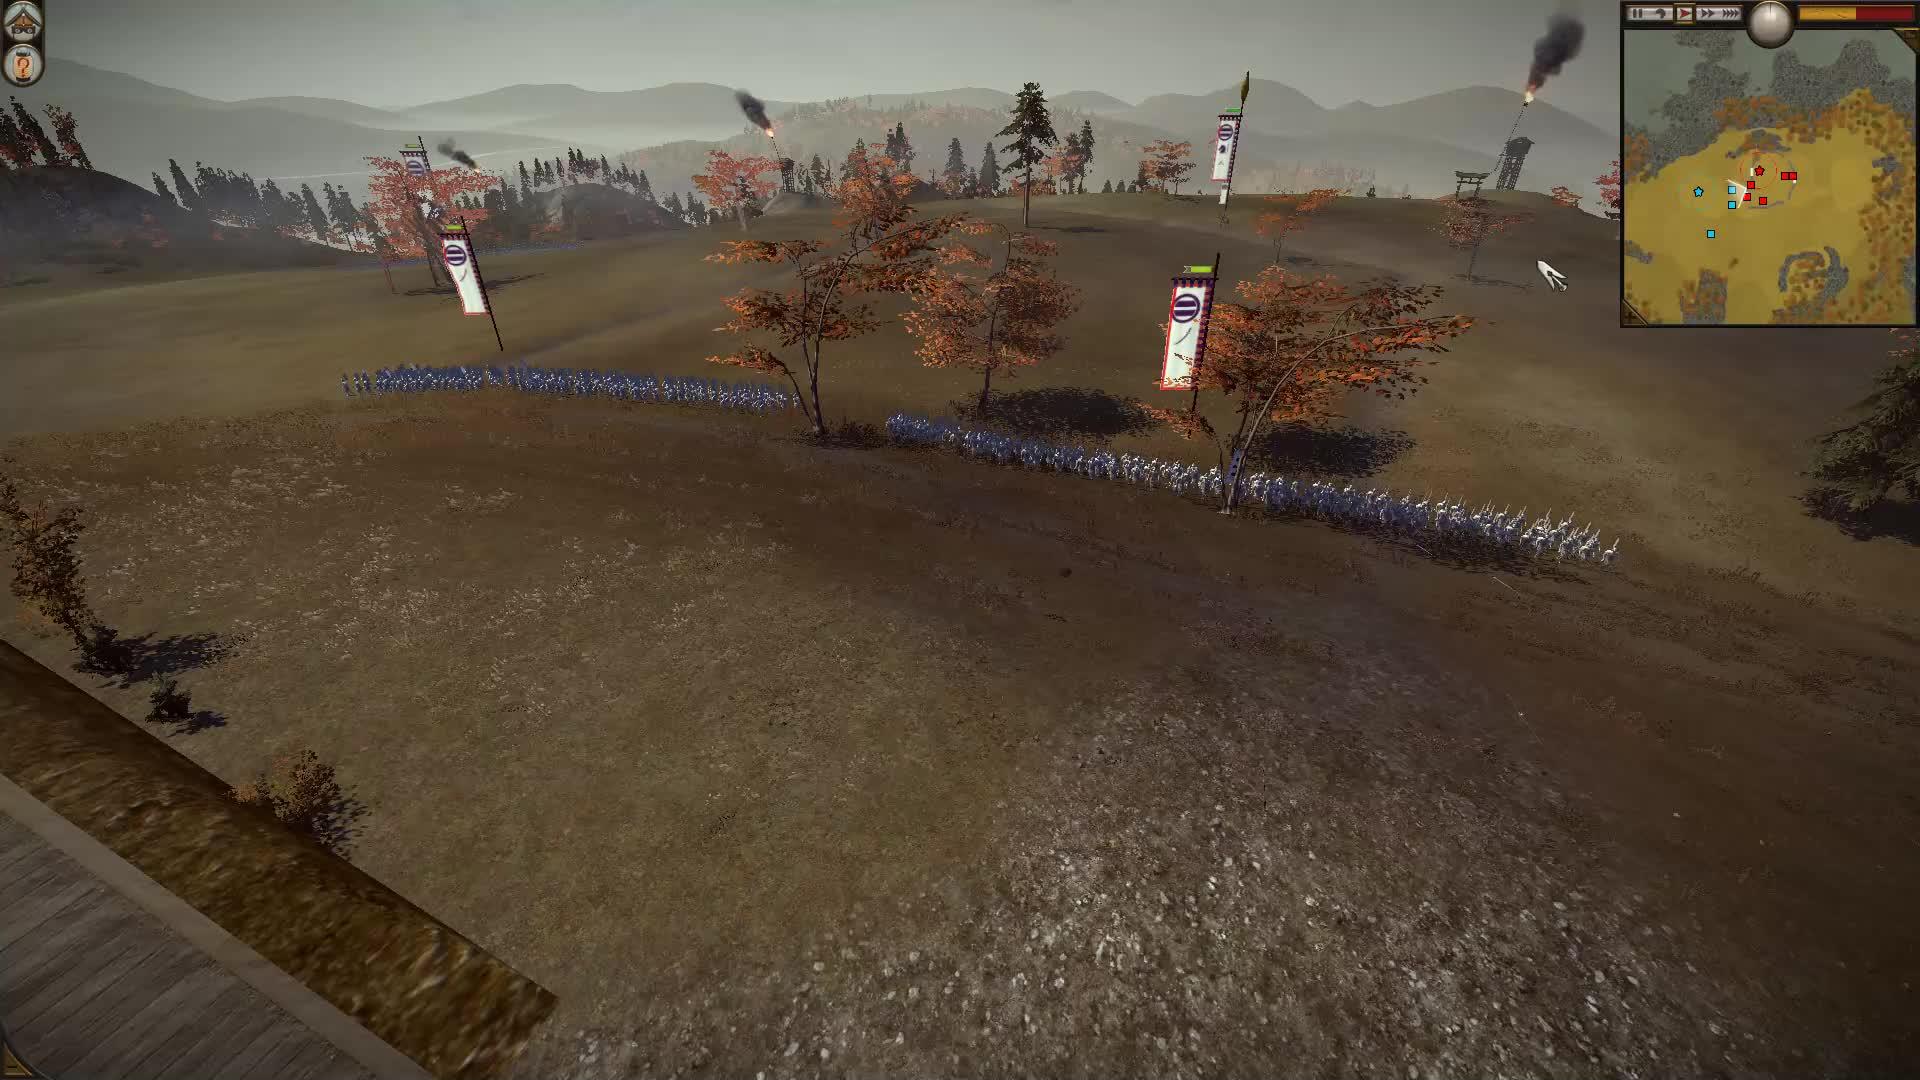 Grenades, Shogun 2, Total War, Grenade Throwers OP GIFs